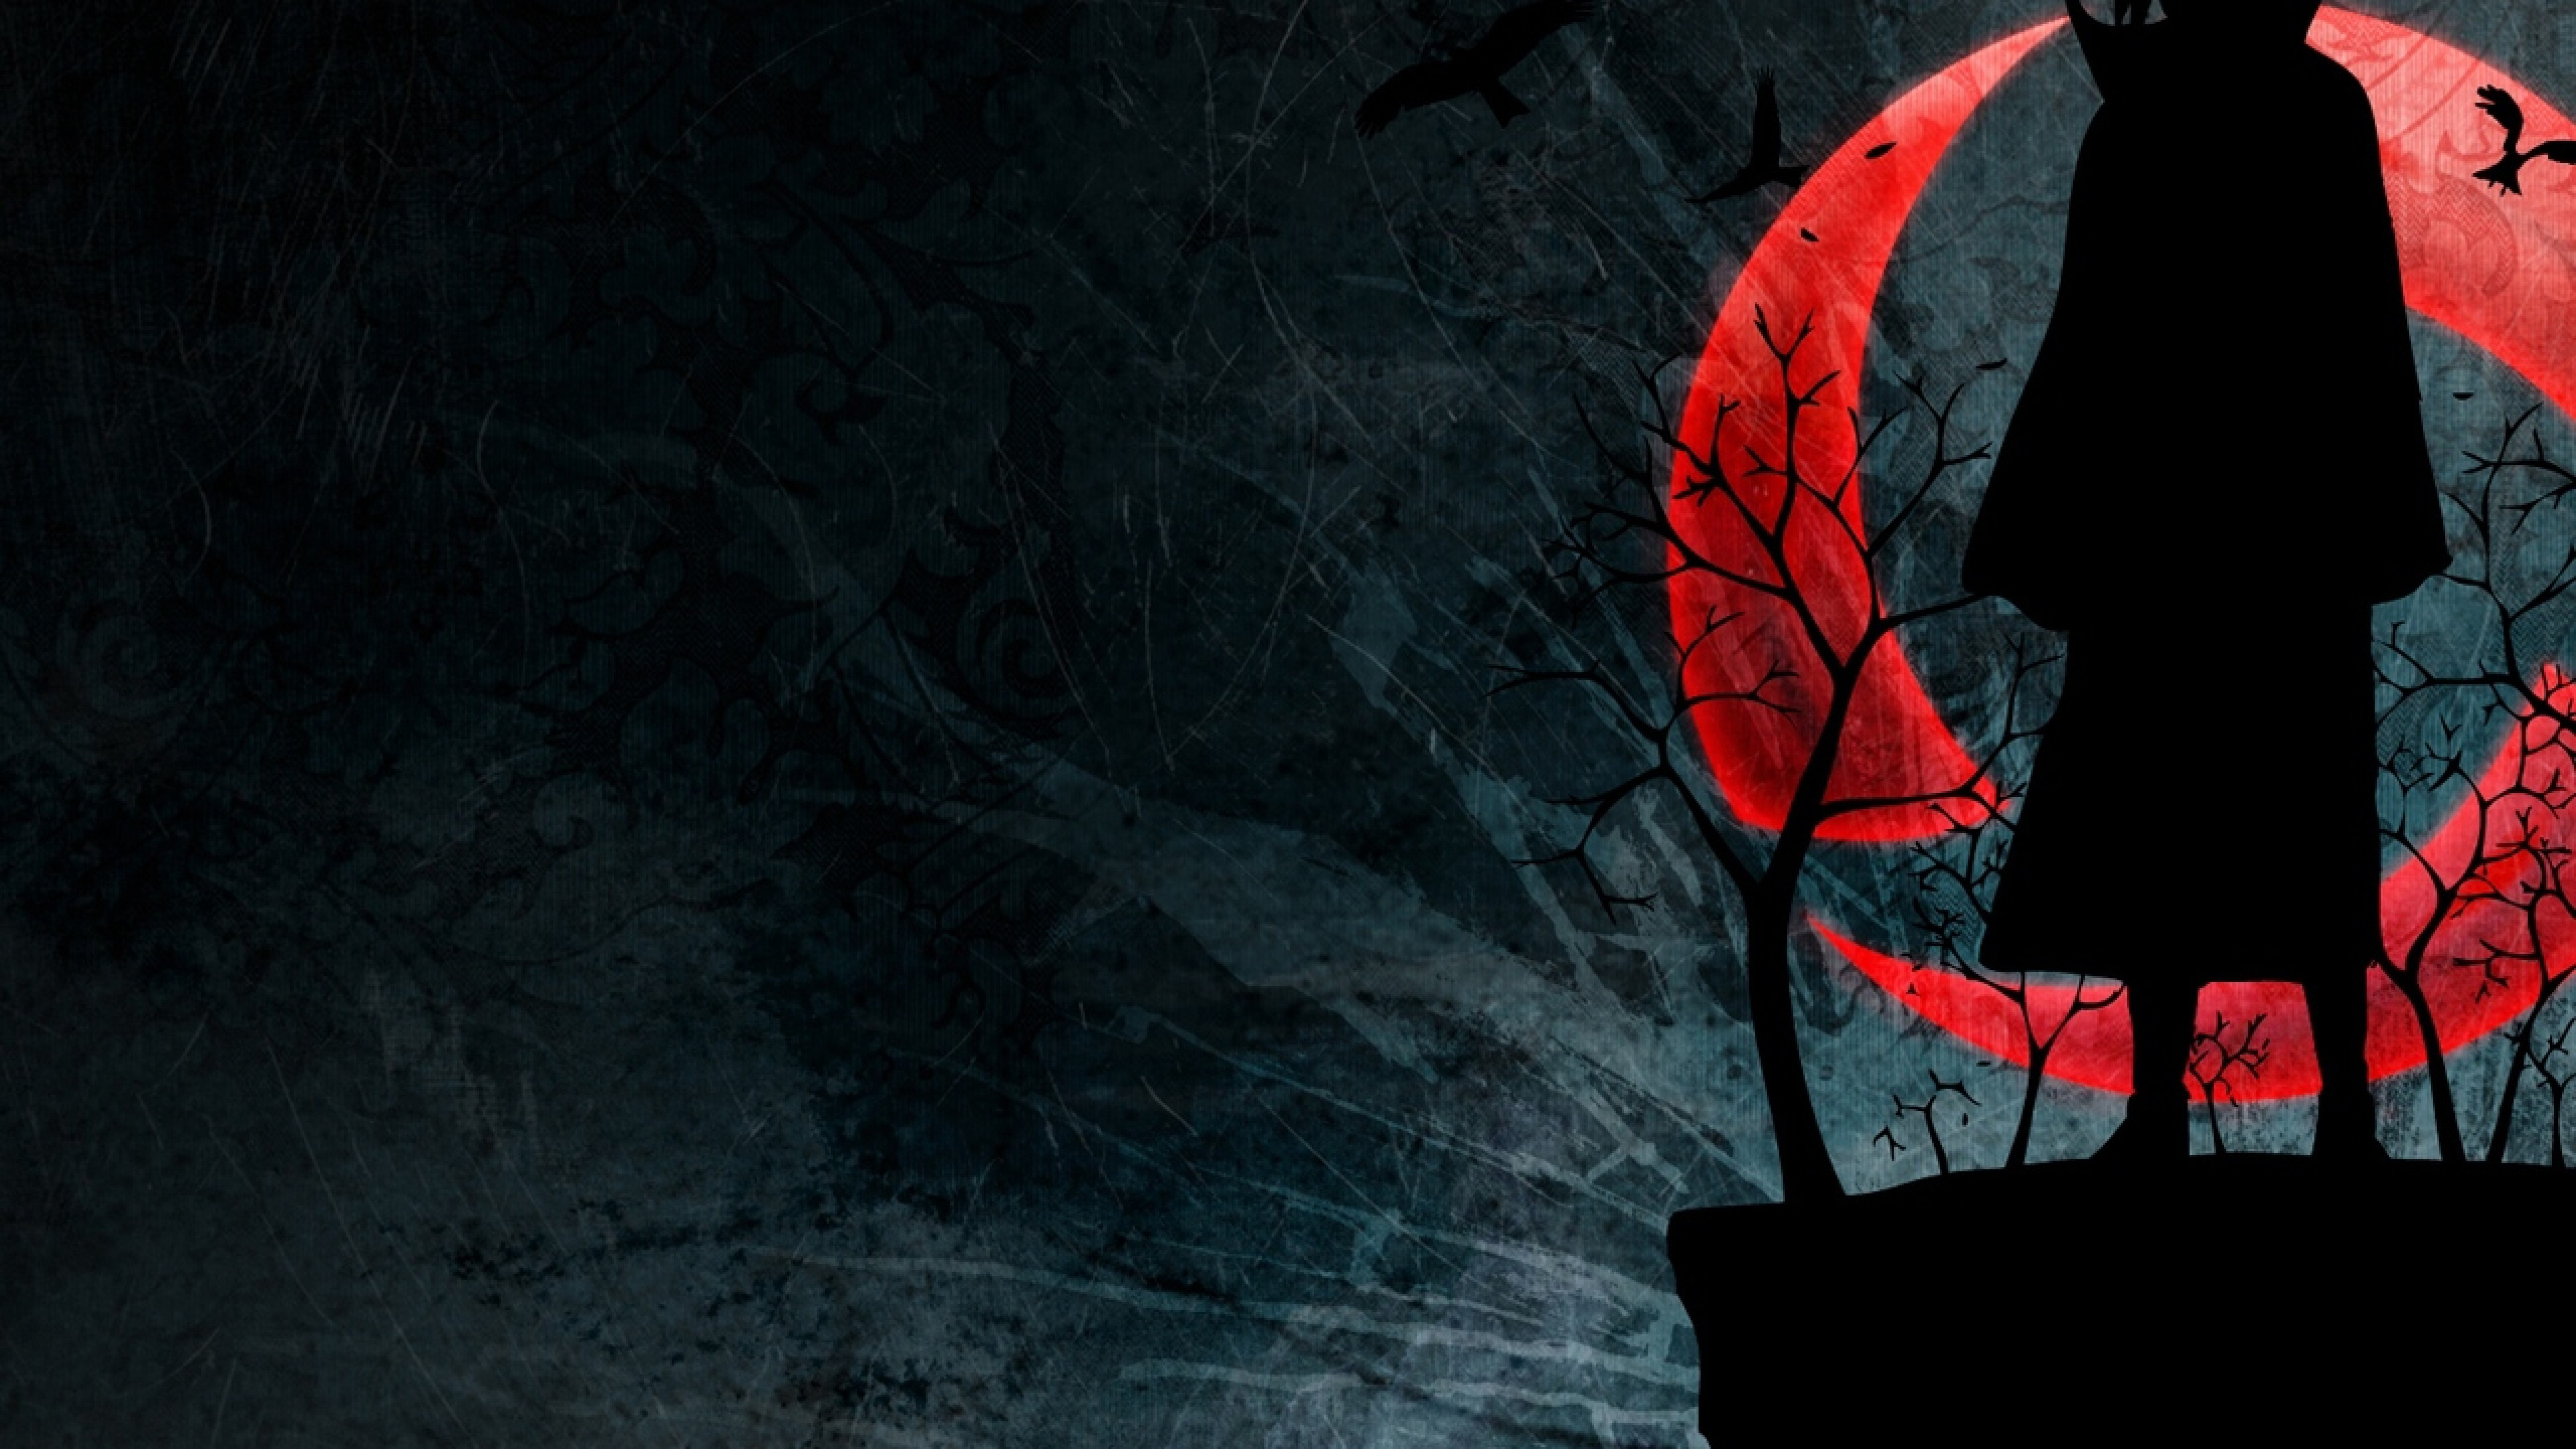 Black Figure At Red Moon Night Hd Wallpaper 4k Ultra Hd Hd Wallpaper Wallpapers Net